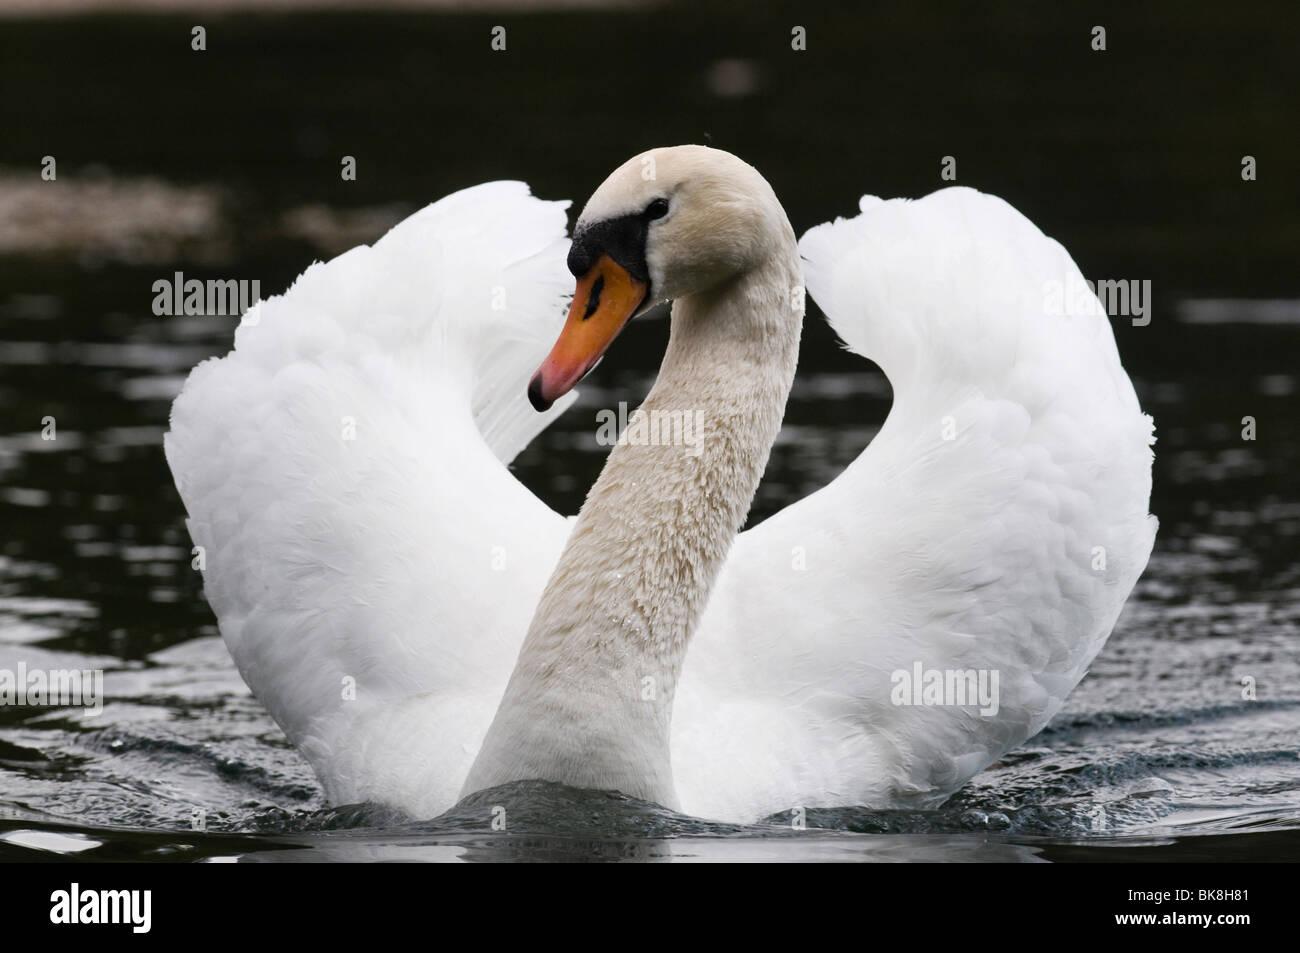 Cisne (Cygnus olor), natación masculina postura de amenaza Imagen De Stock